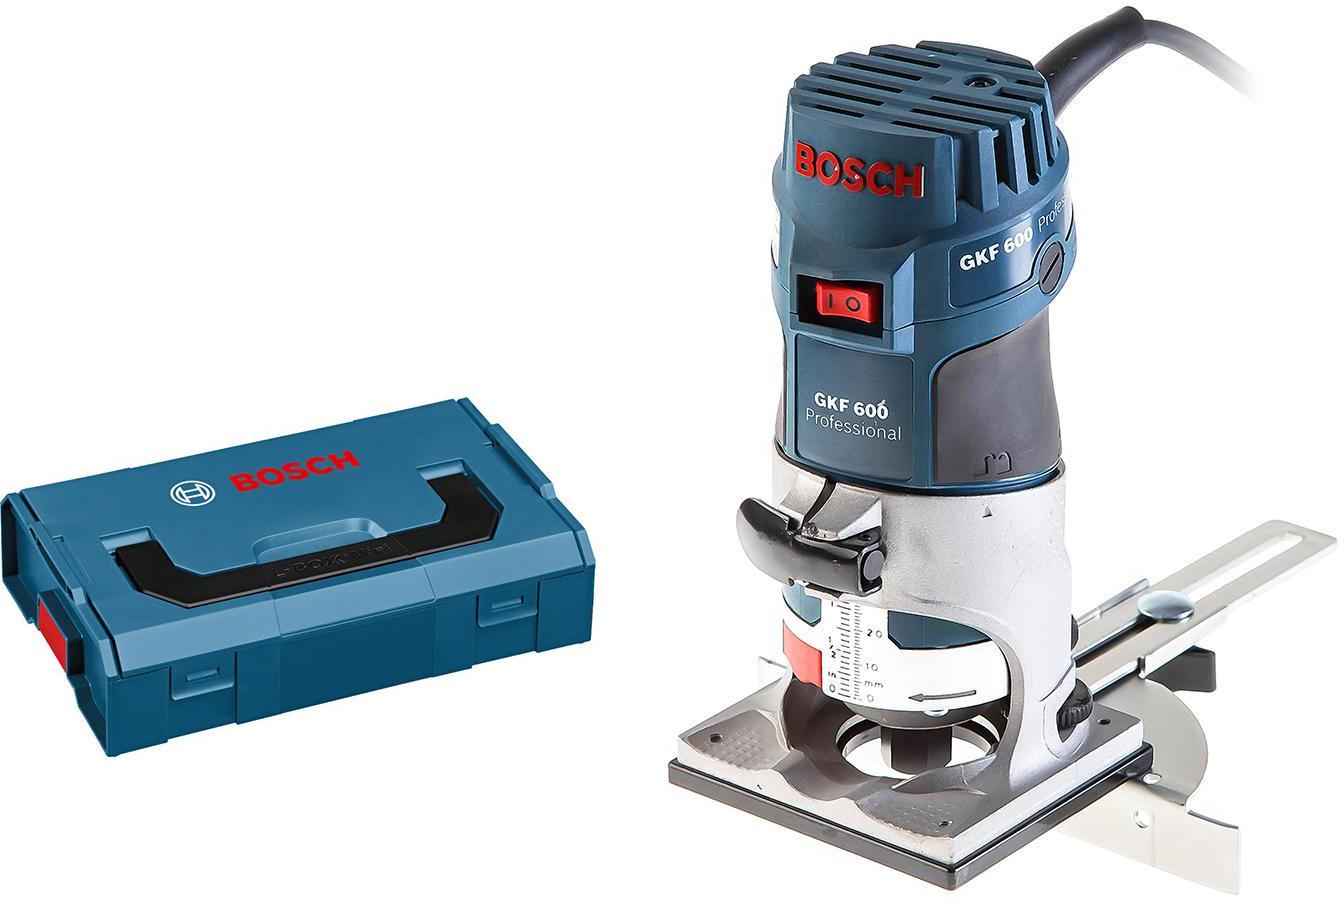 Набор Bosch Фрезер gkf 600 l-boxx (0.601.60a.102) +Ящик l-boxx mini (1.600.a00.7sf), Фрезер gkf 600 l-boxx (0.601.60a.102) +Ящик l-boxx mini (1.600.a00.7sf)